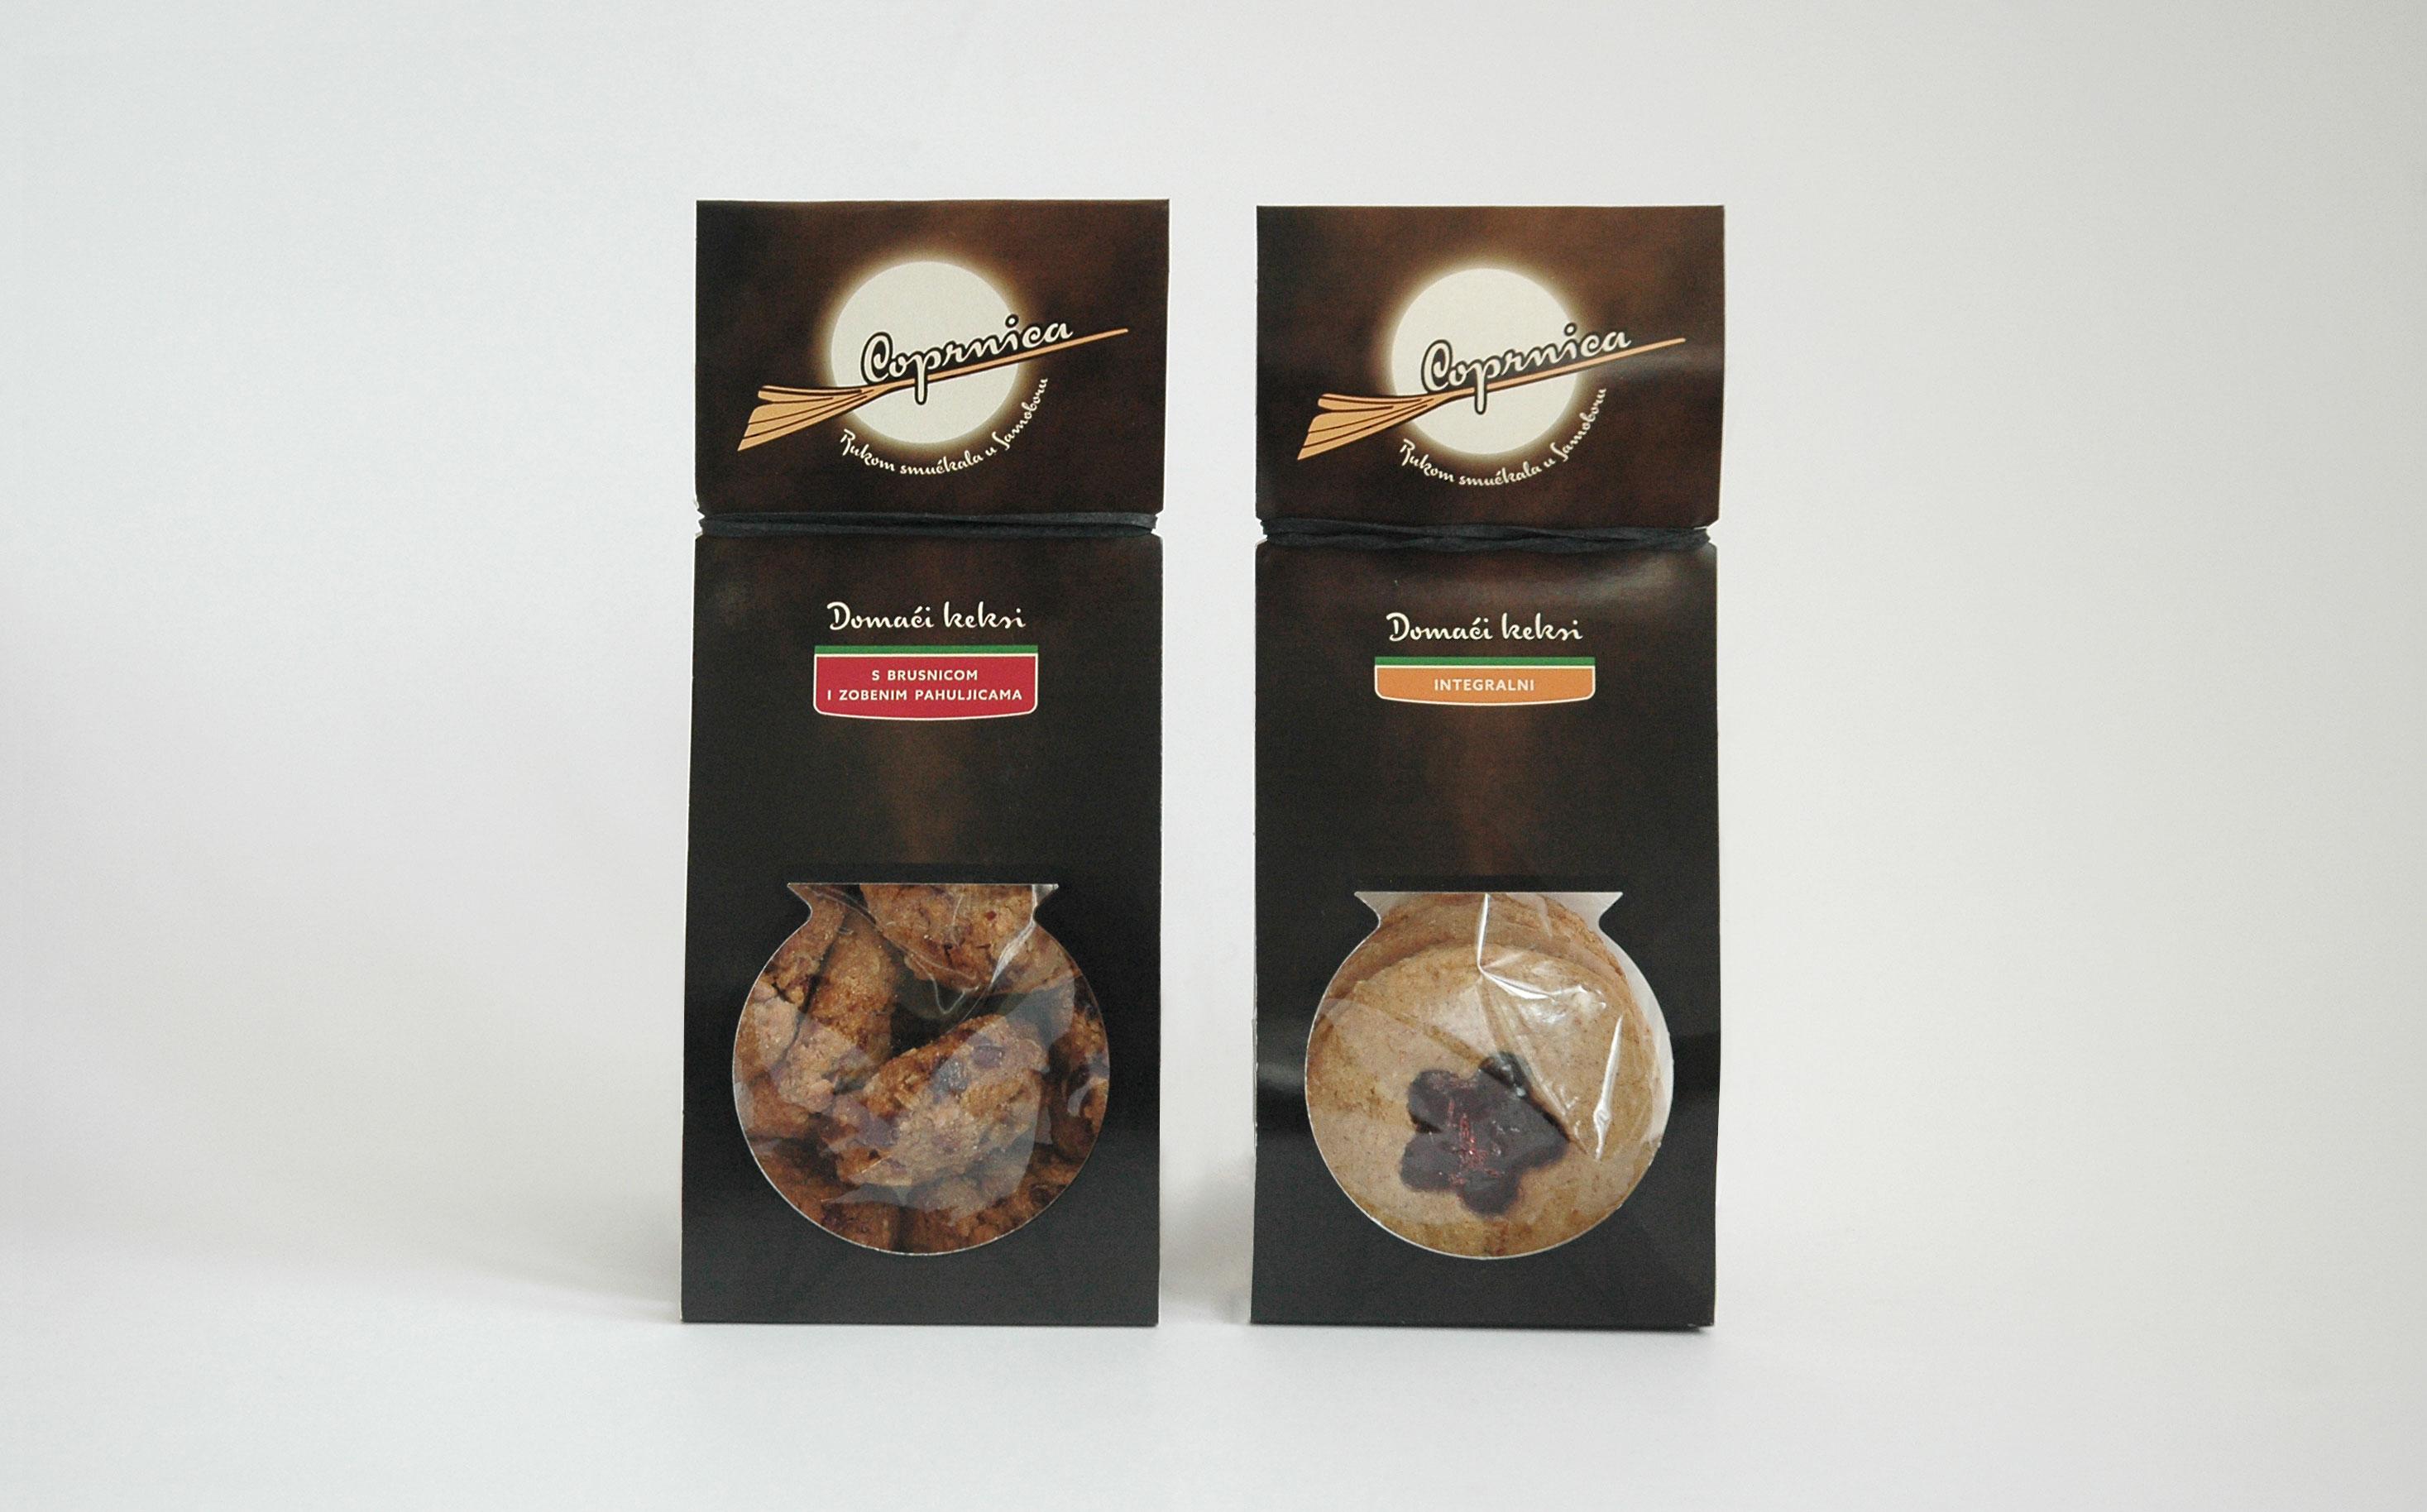 masavukmanovic.com - coprnica packaging 04